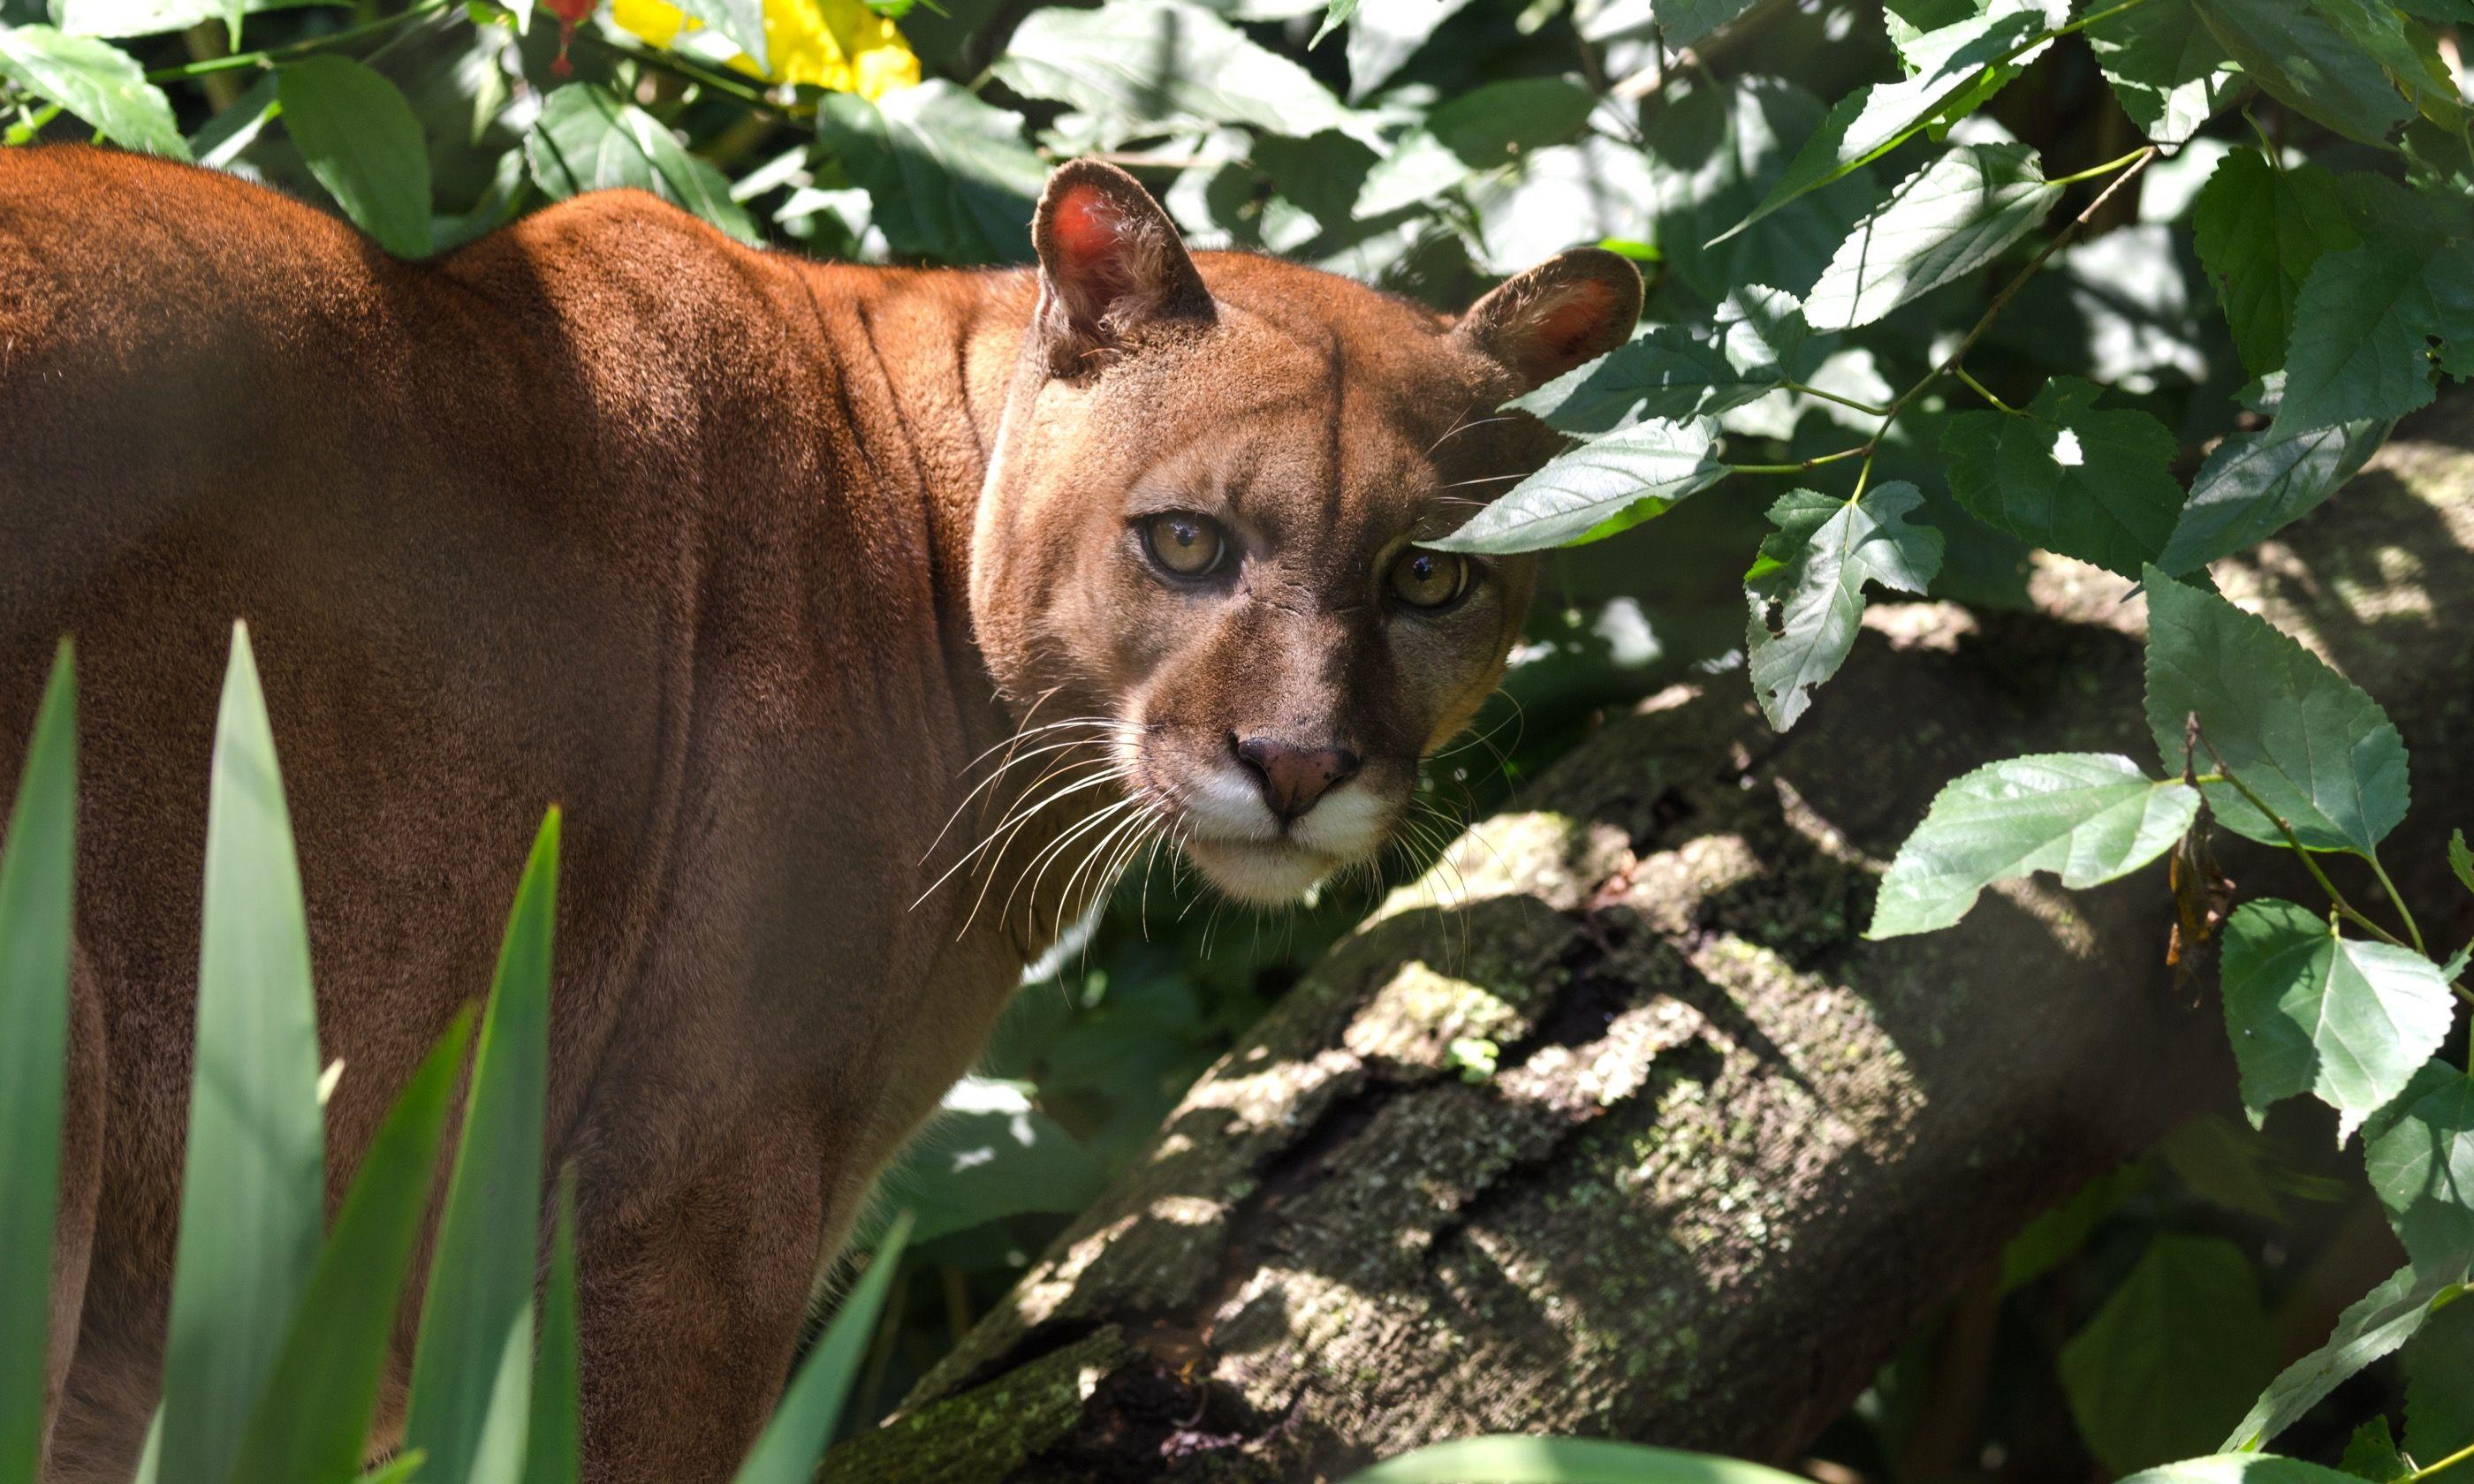 Puma amongst leaves (Shutterstock.com)